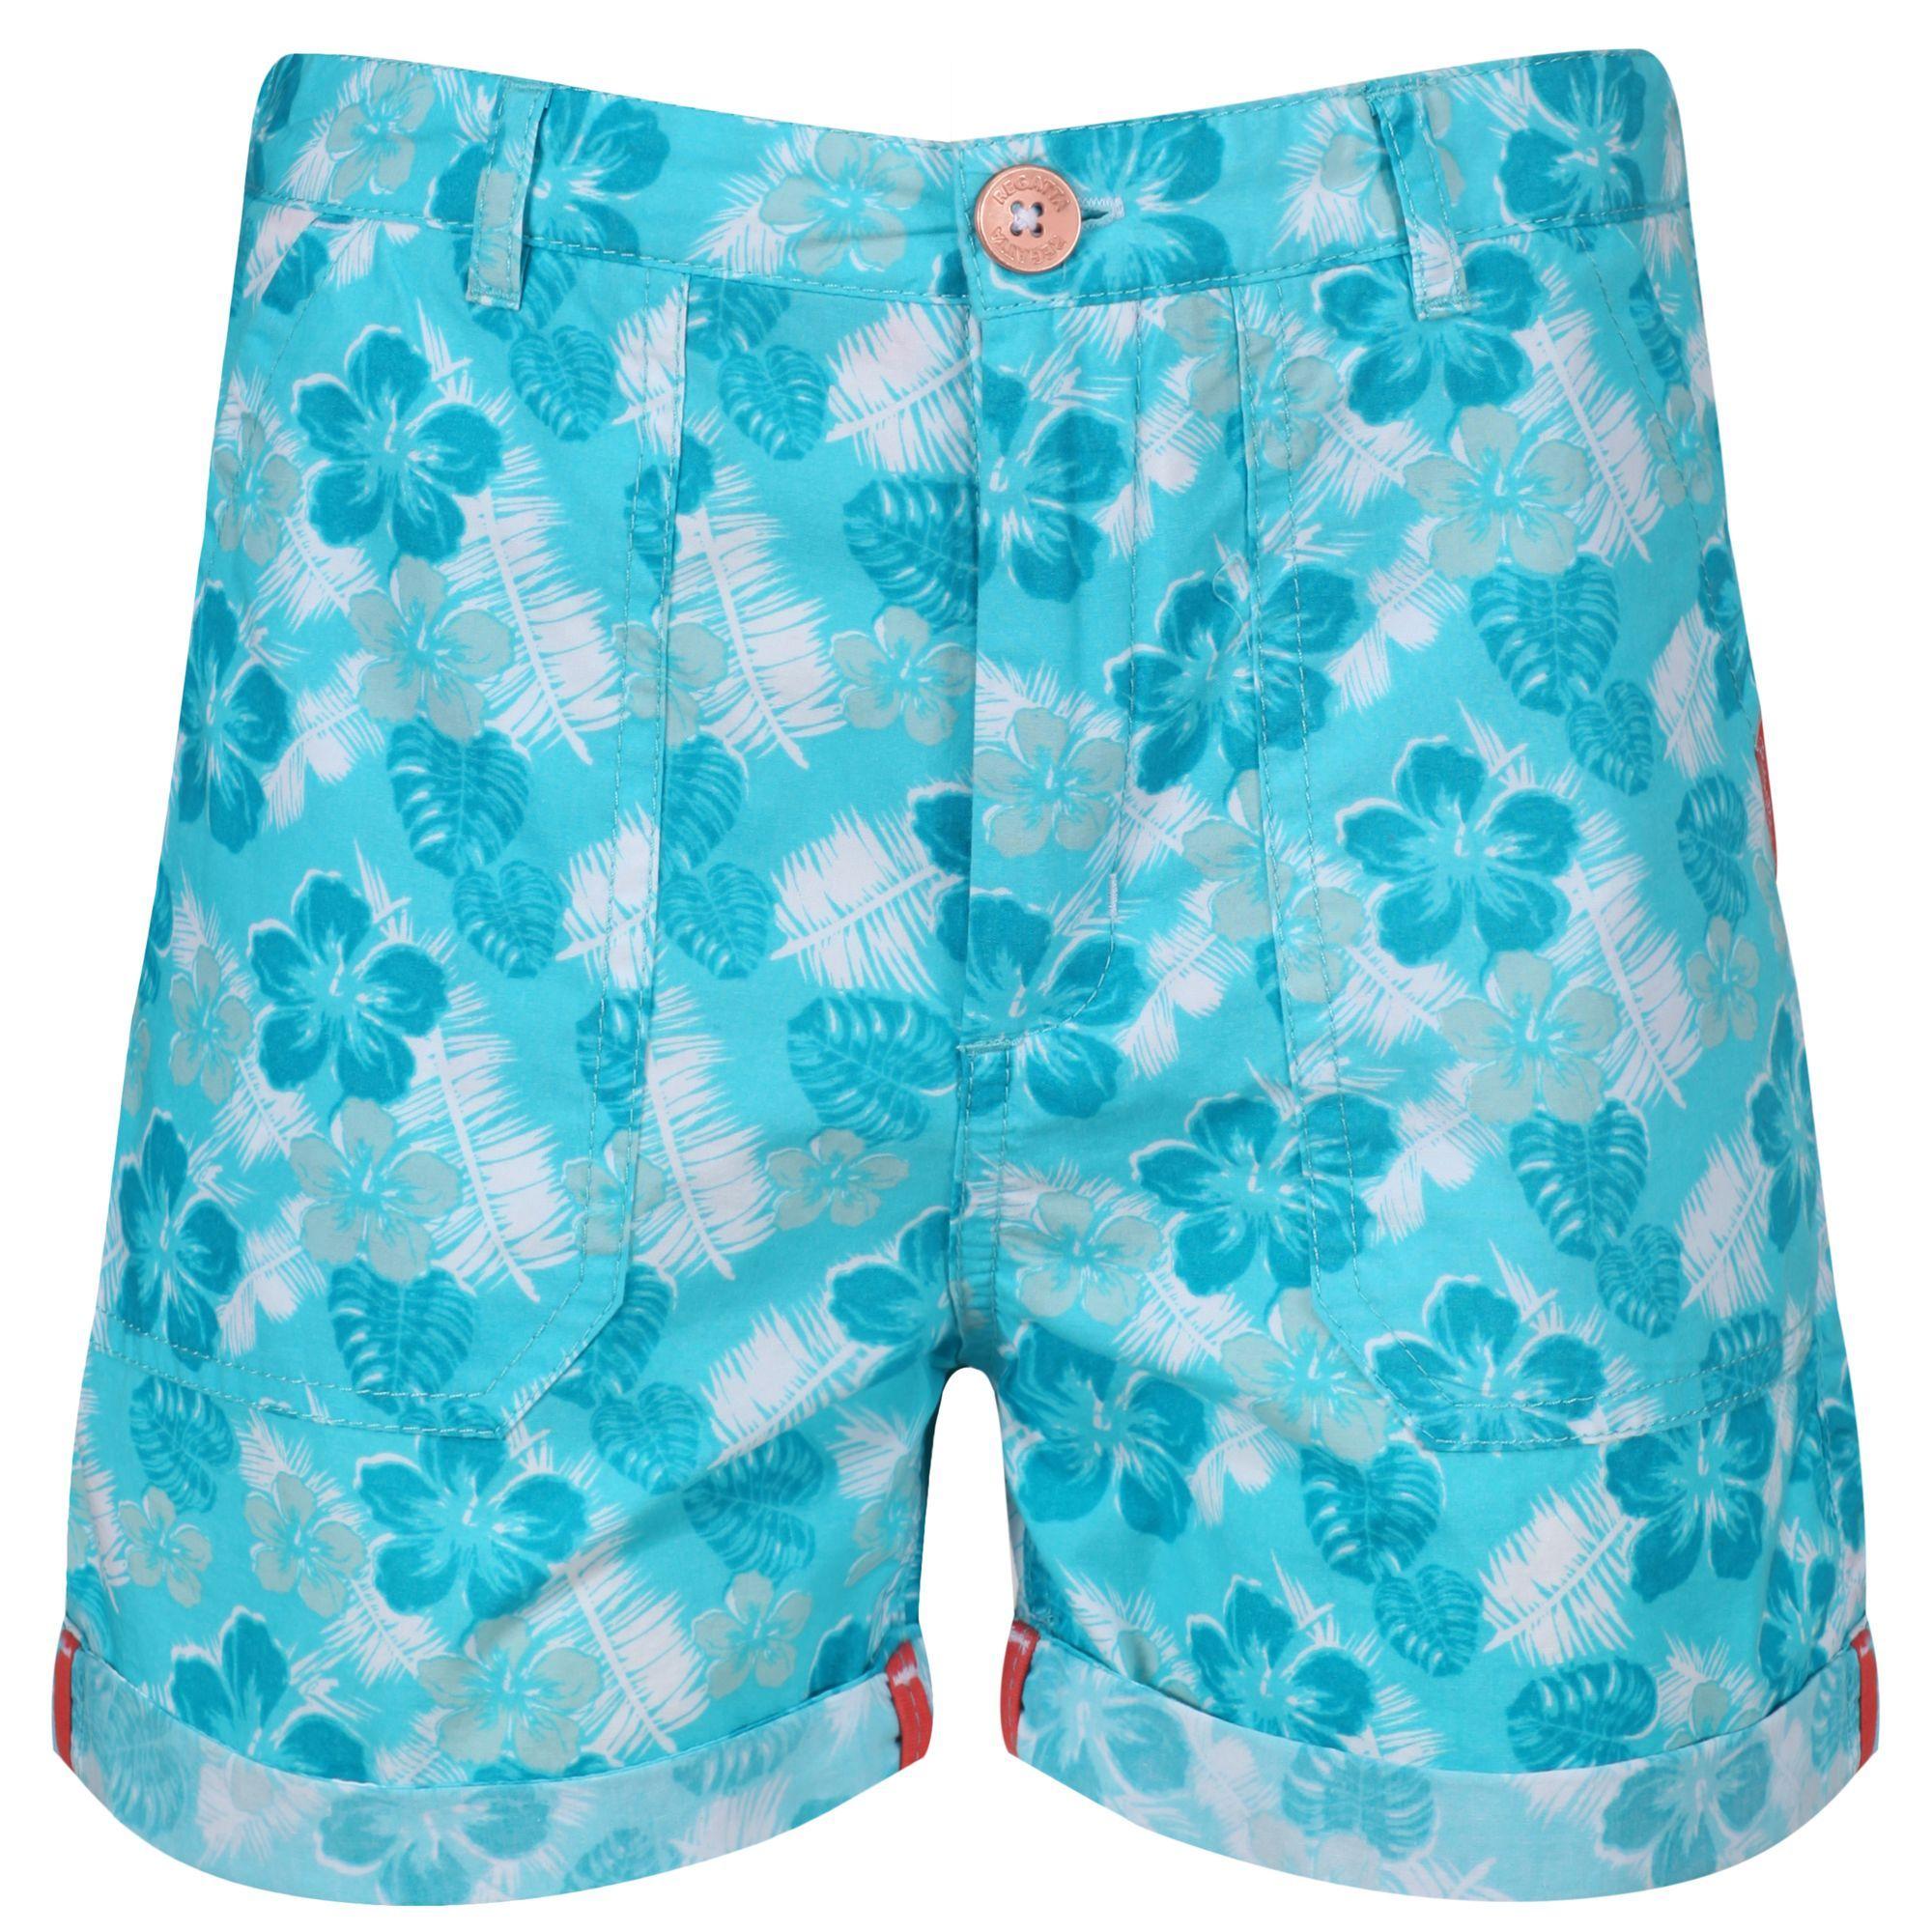 Regatta Childrens/Kids Damzel Shorts